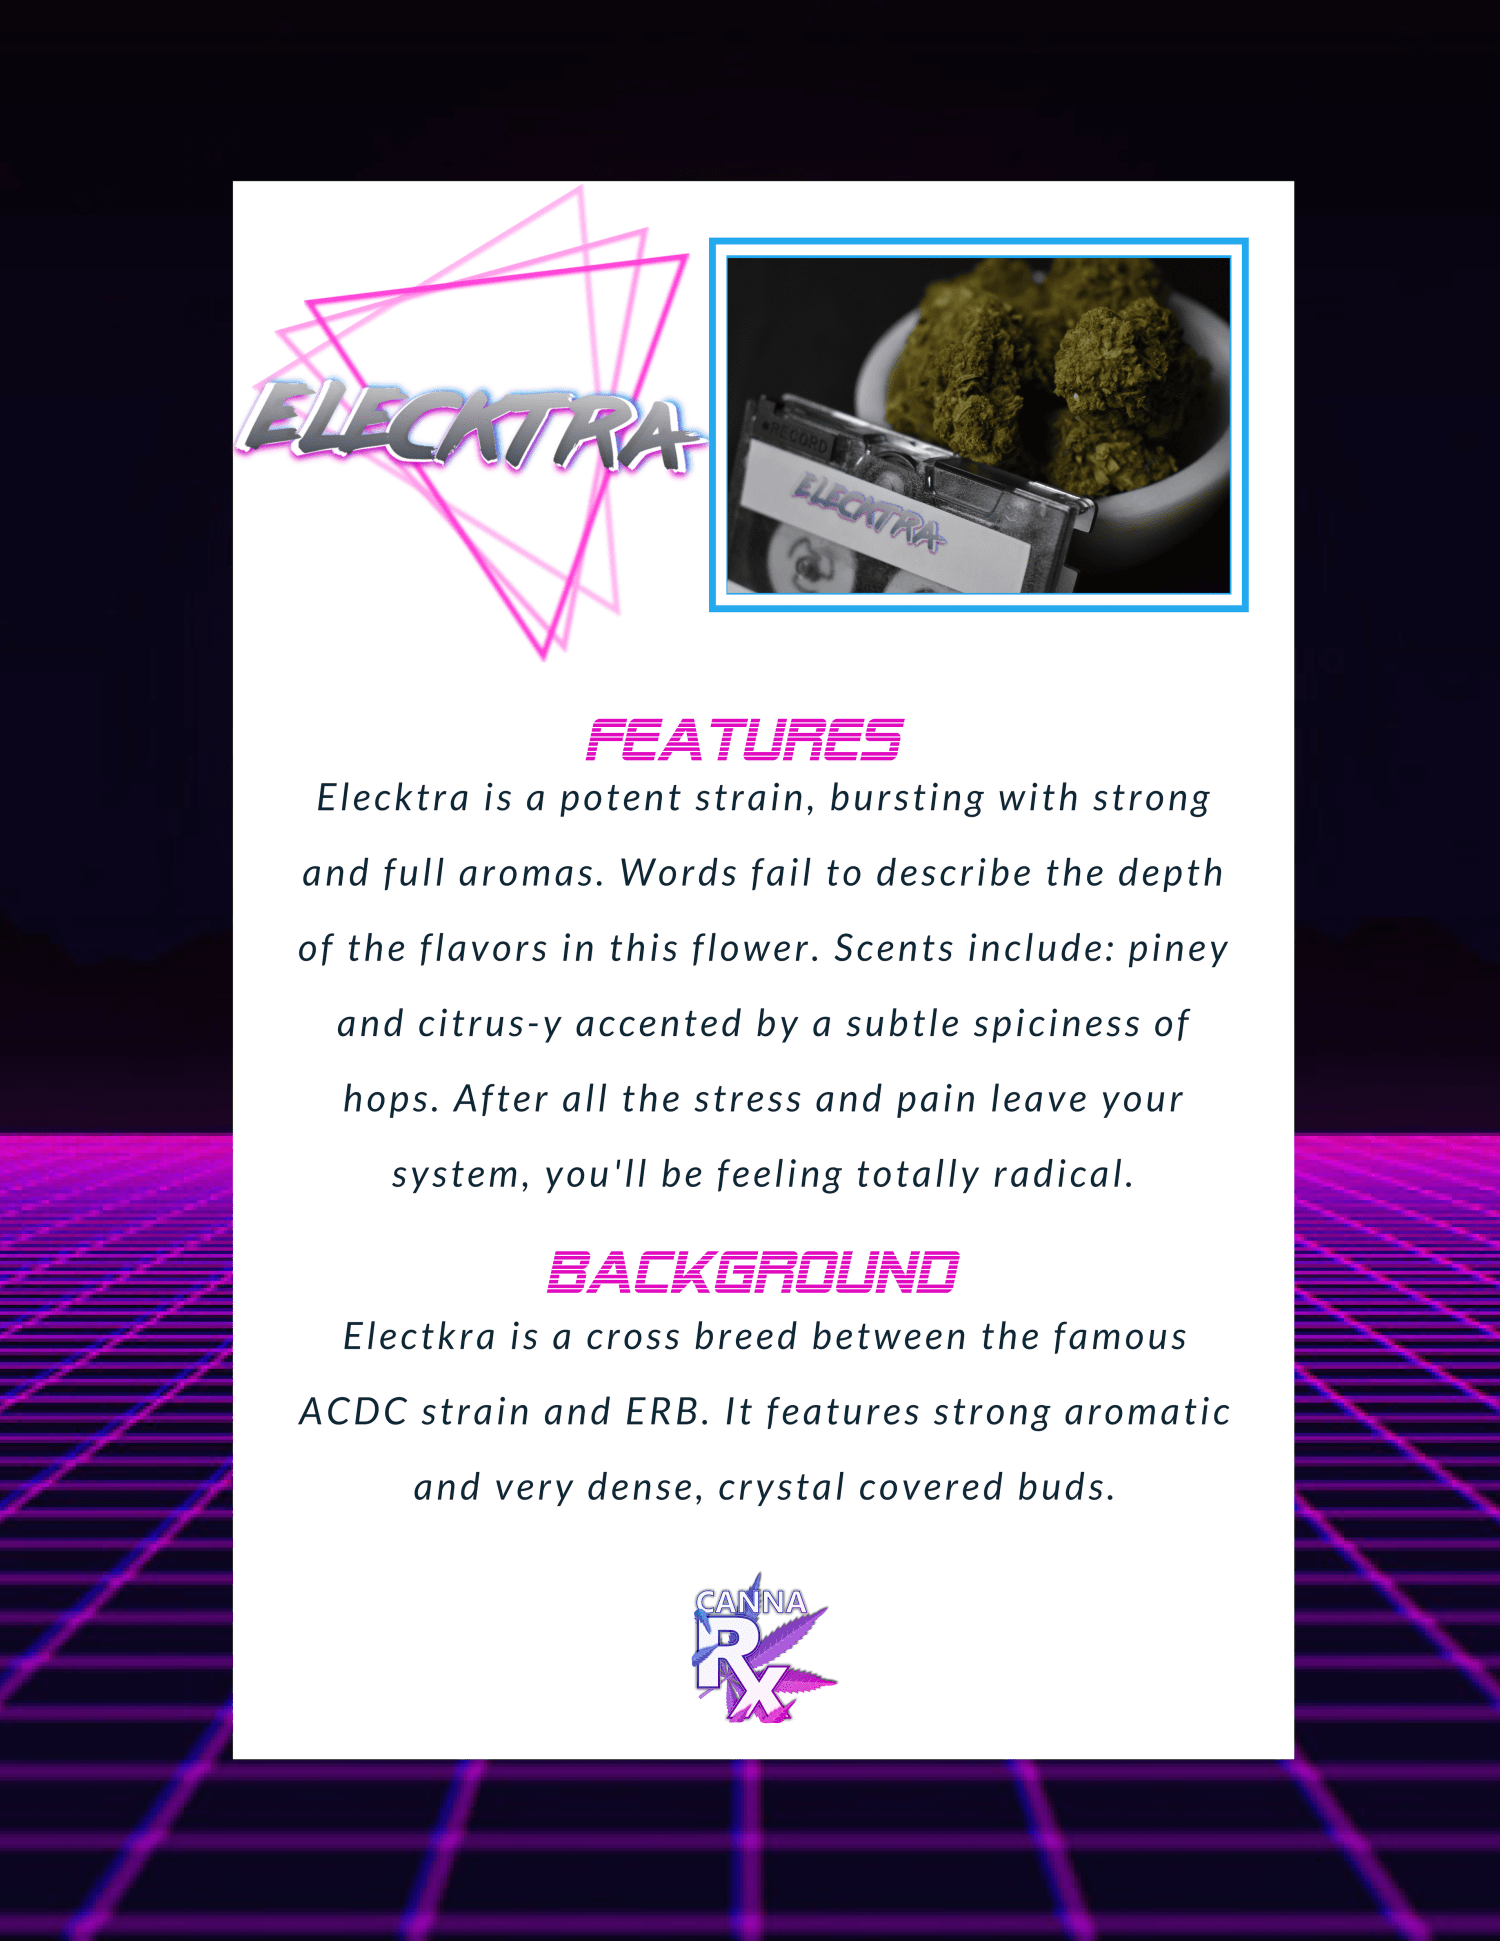 elecktra features